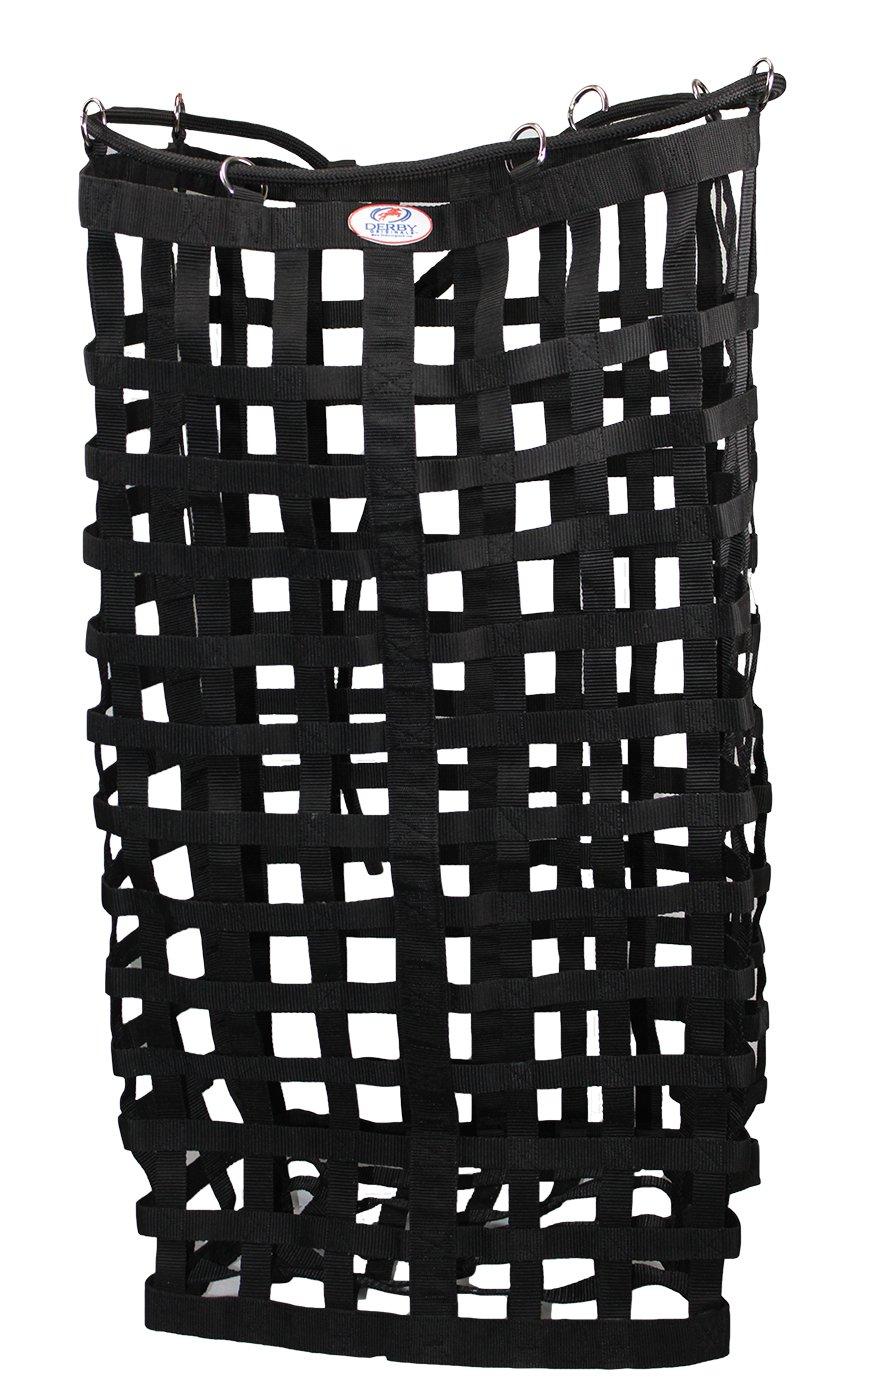 Derby Originals XL Go Around 4 Sided Slow Feed Hay Bale Bag Patented (Black) by Derby Originals (Image #5)